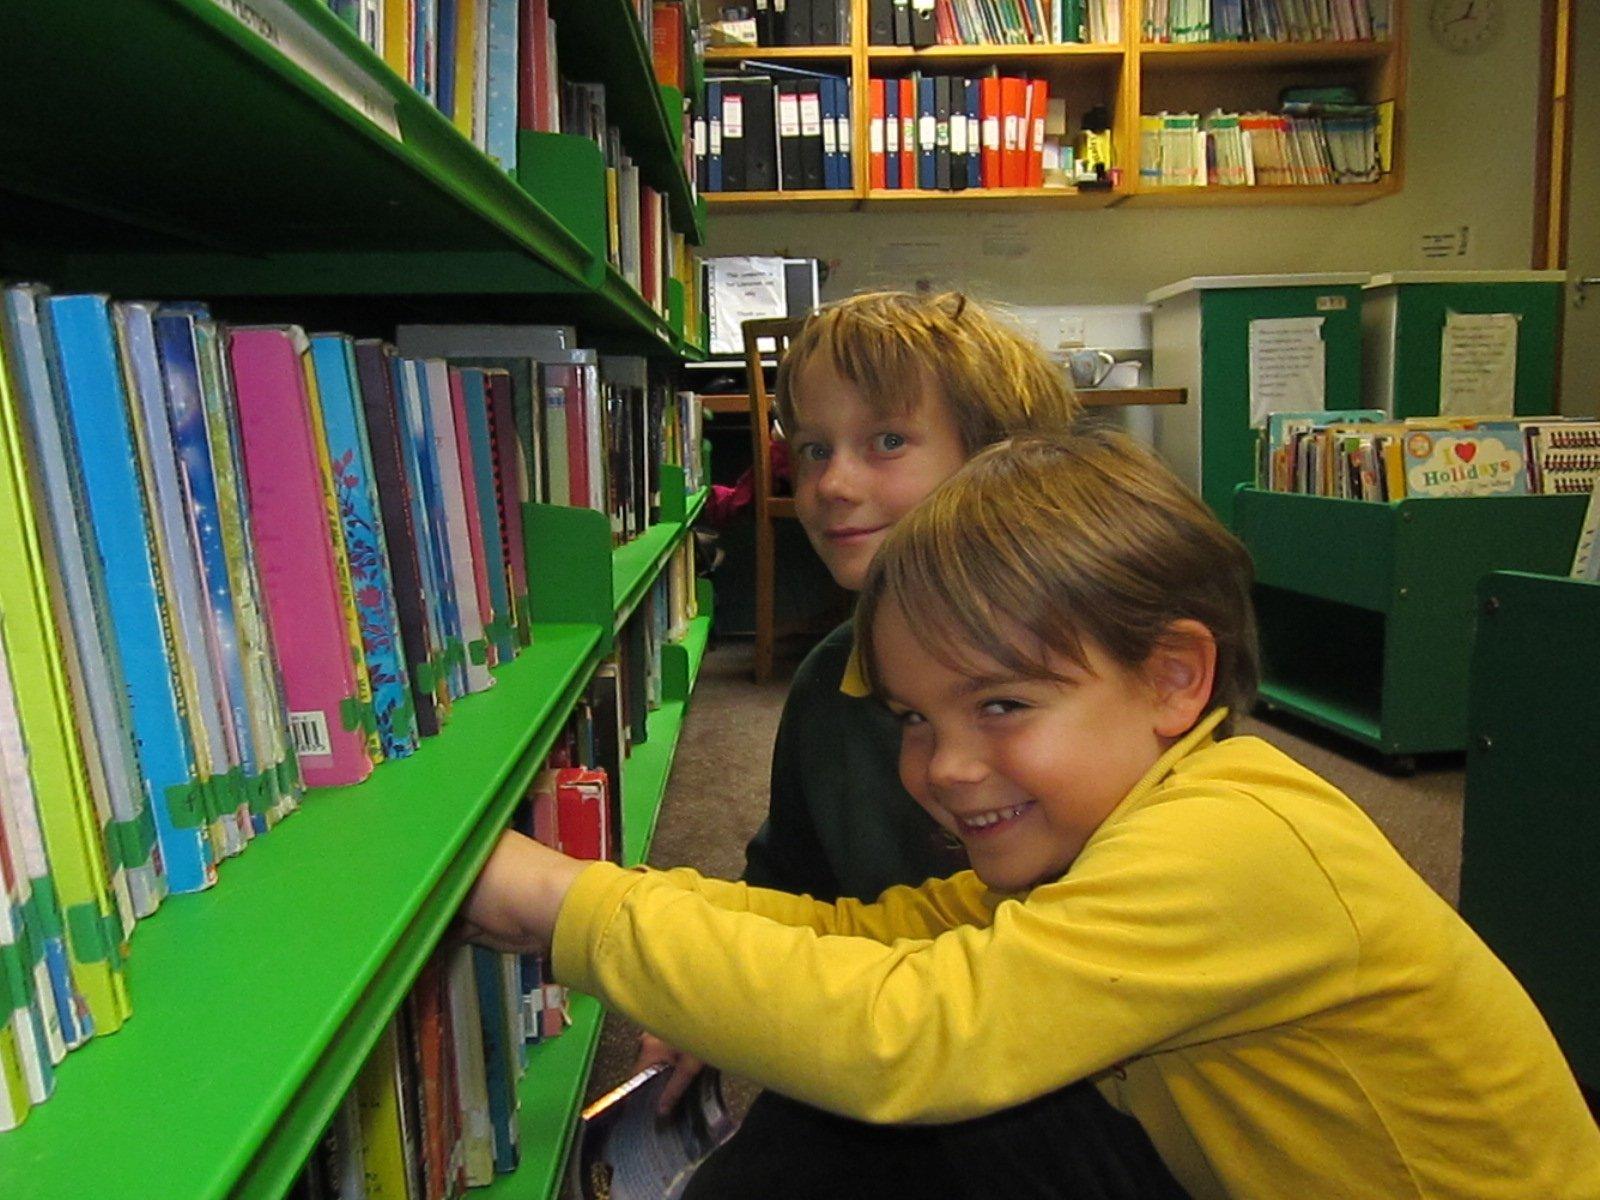 Should we boost children's IQ?